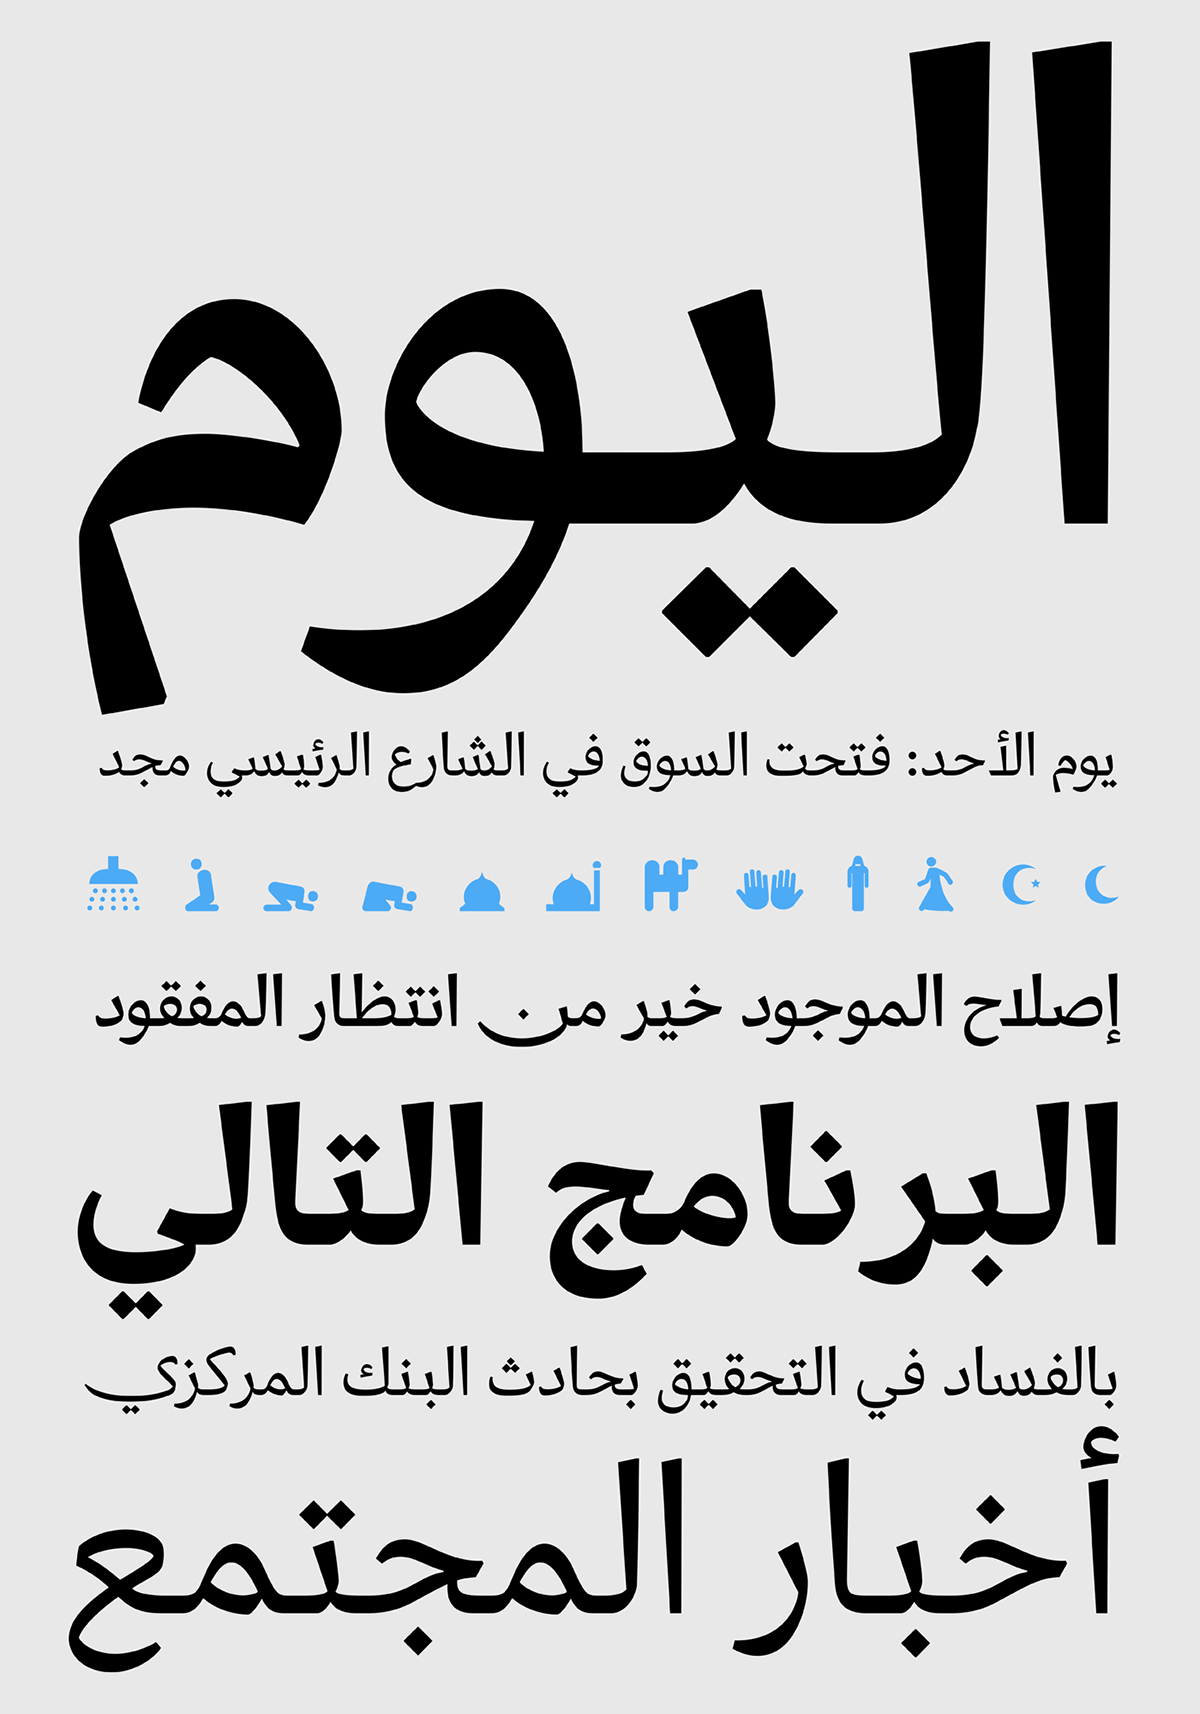 din serif arabic font design foundry Panos Vassiliou font Typeface Hasan Abu Afash modern